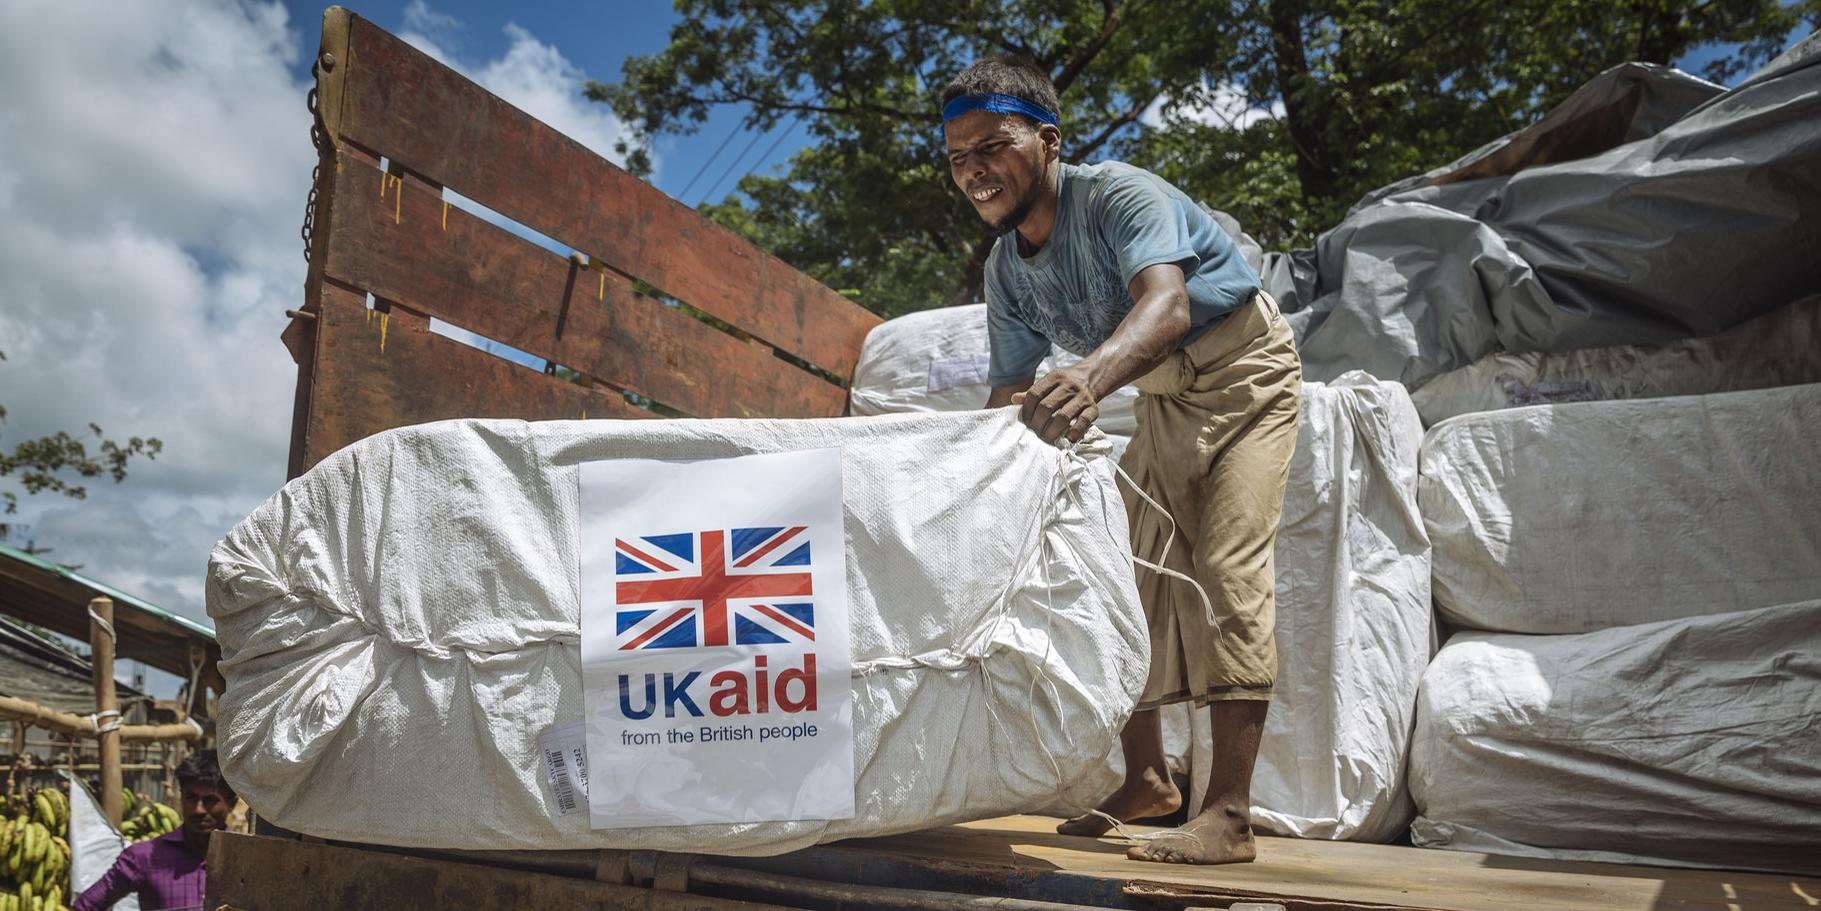 UK aid. Photo: DFID (CC BY 2.0)